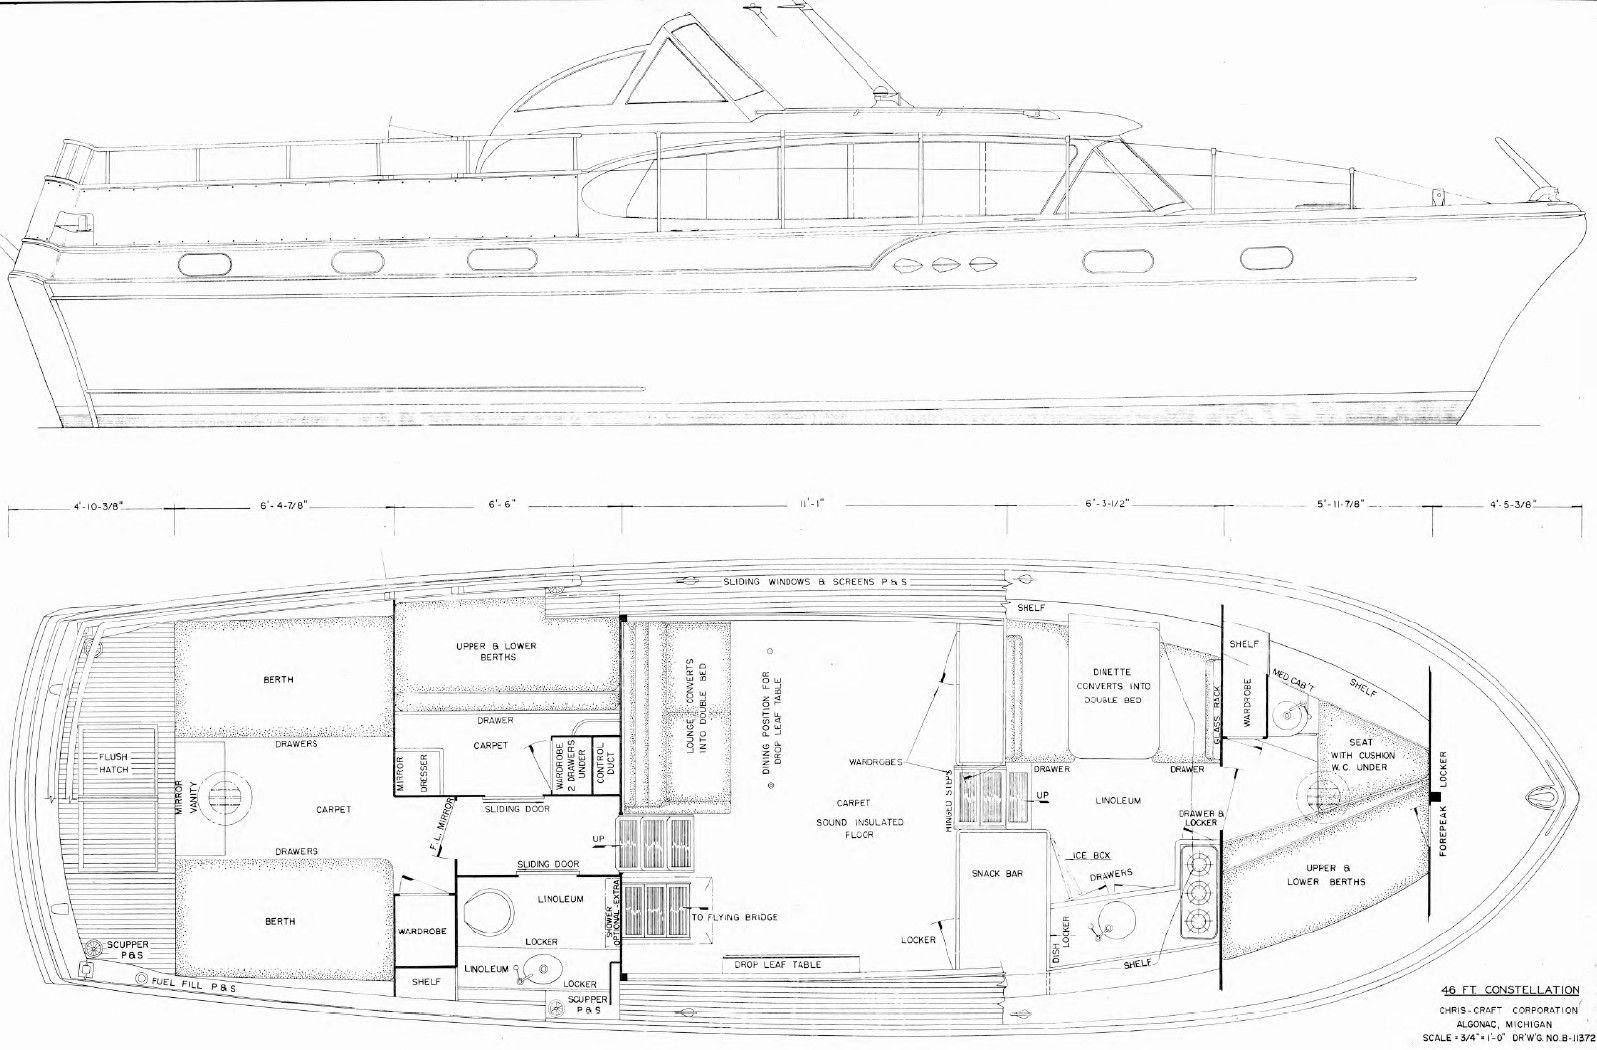 hight resolution of 1957 46 chris craft constellation plan drawing